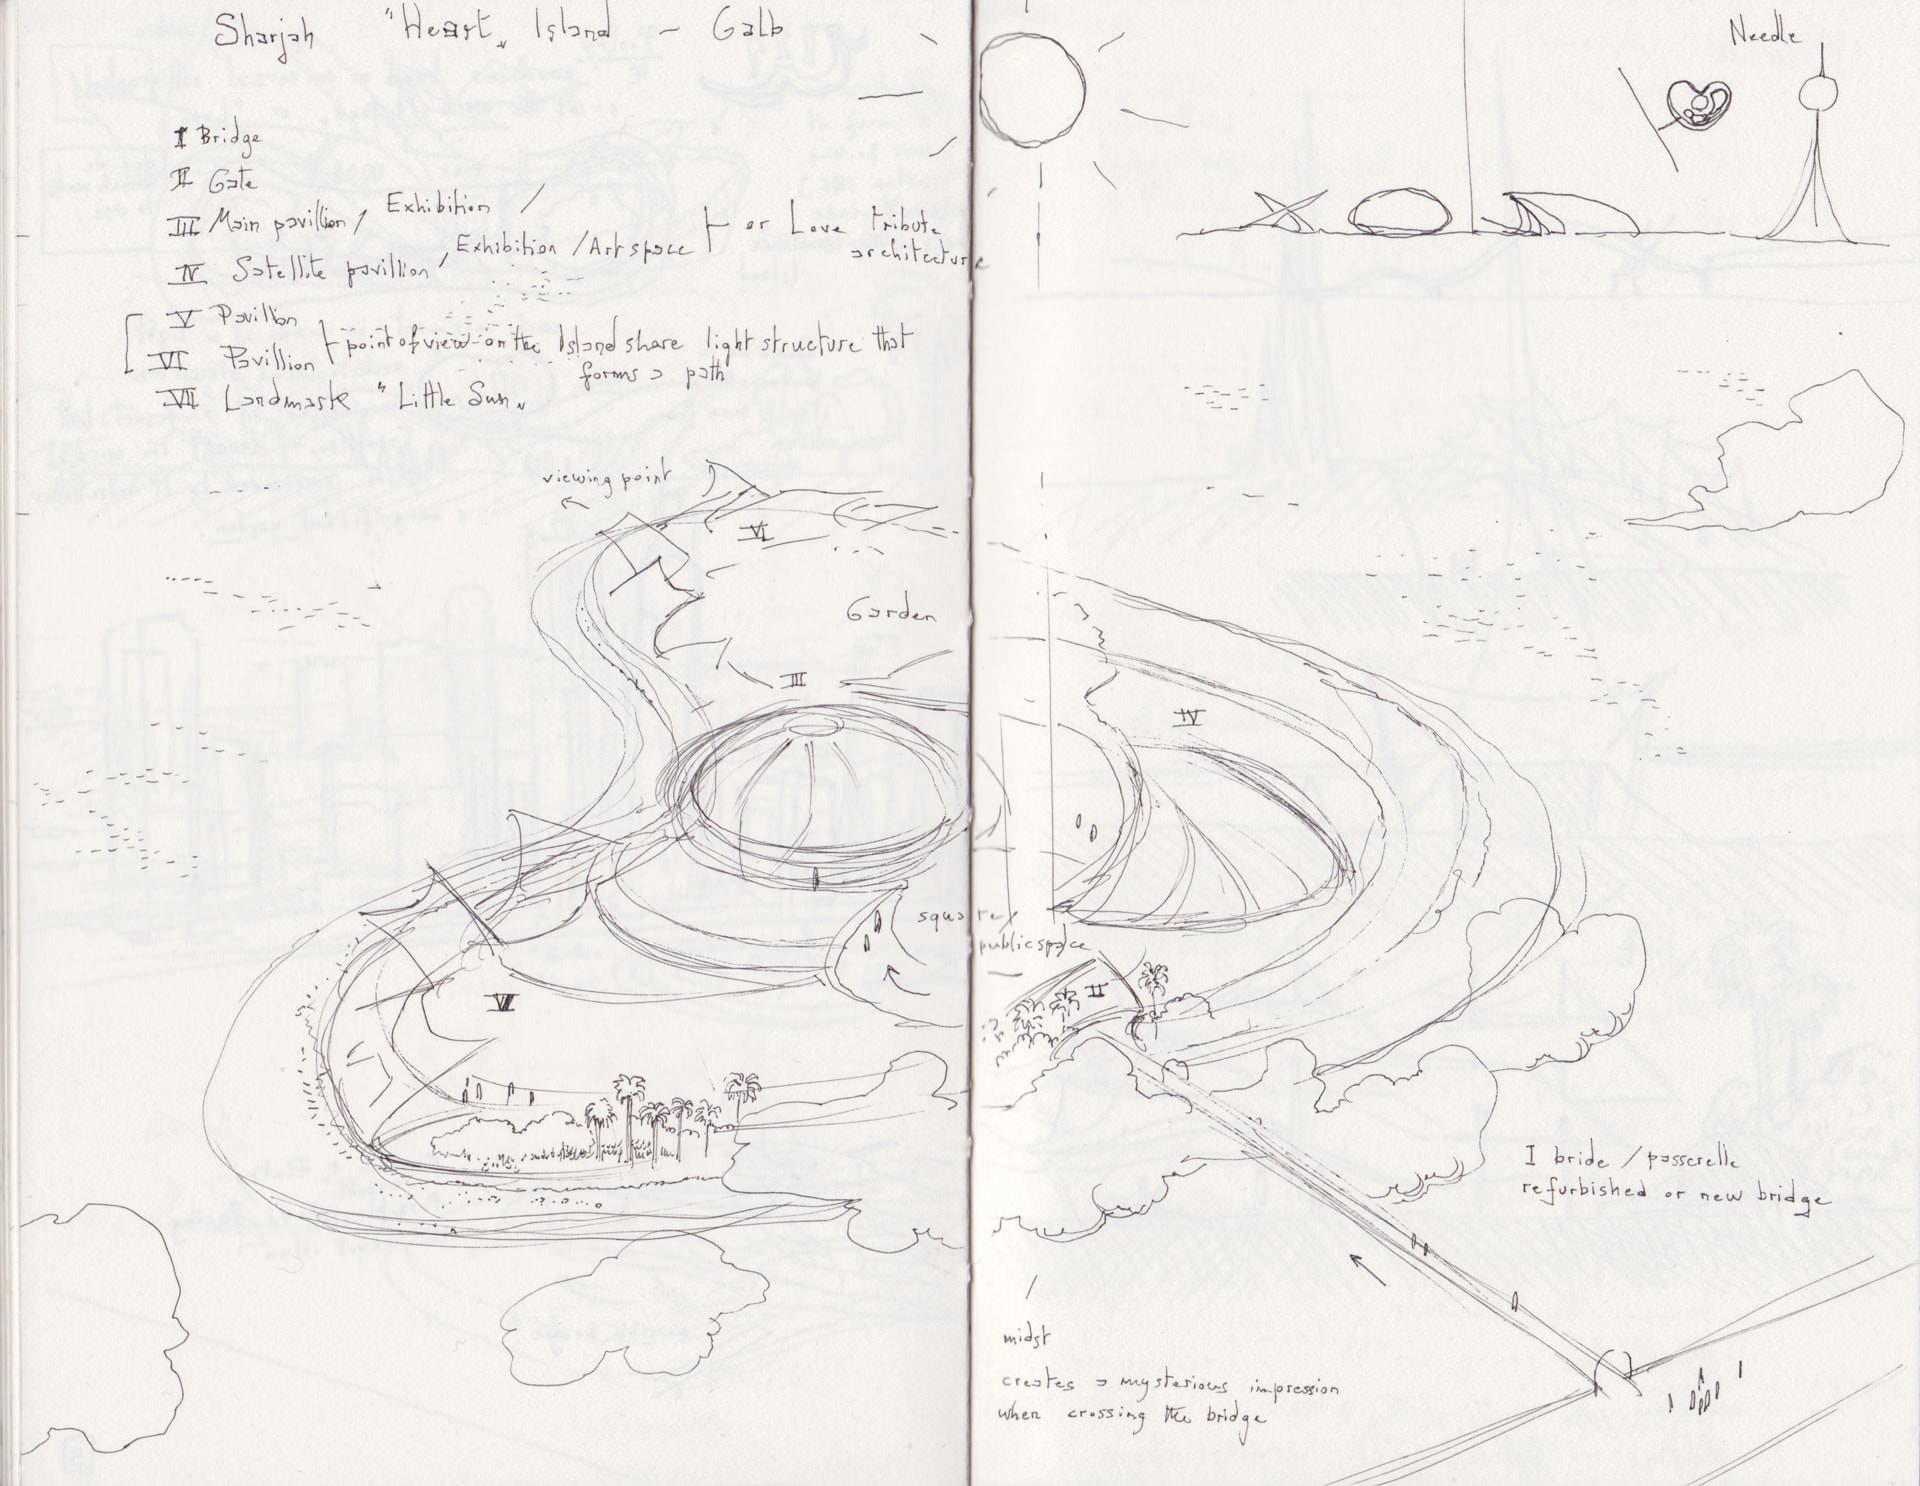 Sharjah Galb island sketch.